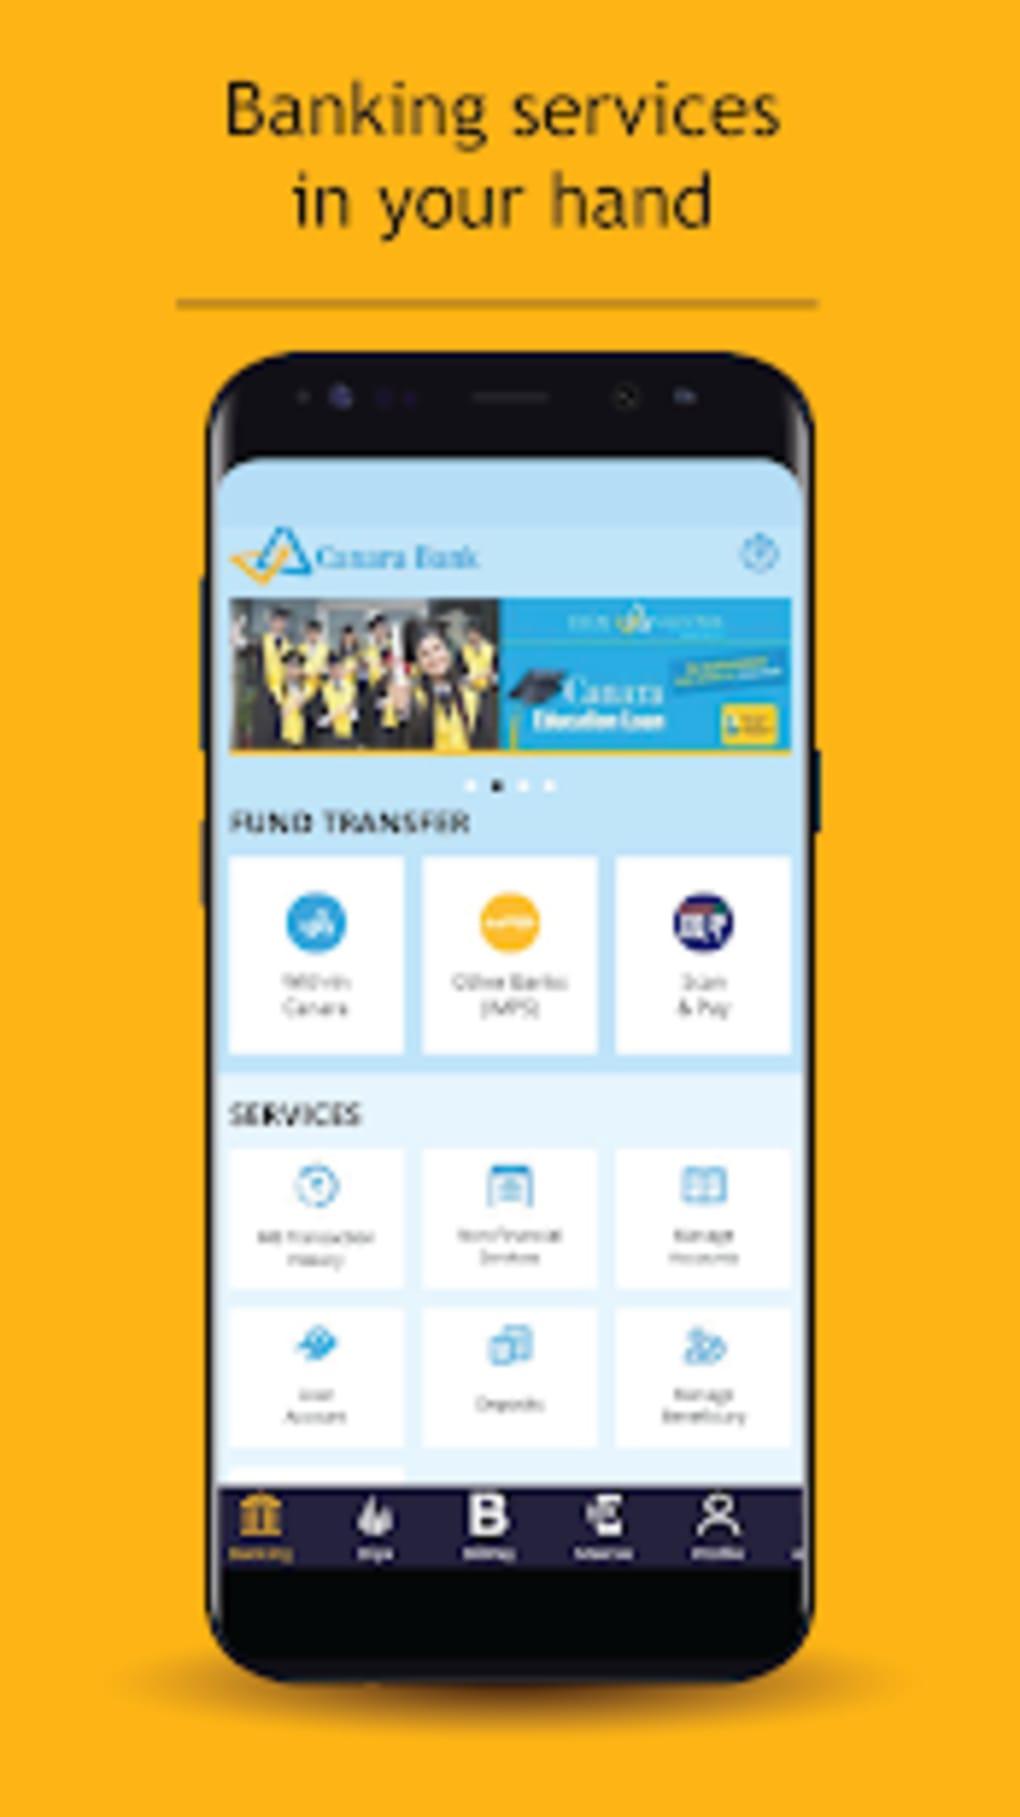 pnb mobile banking app latest version